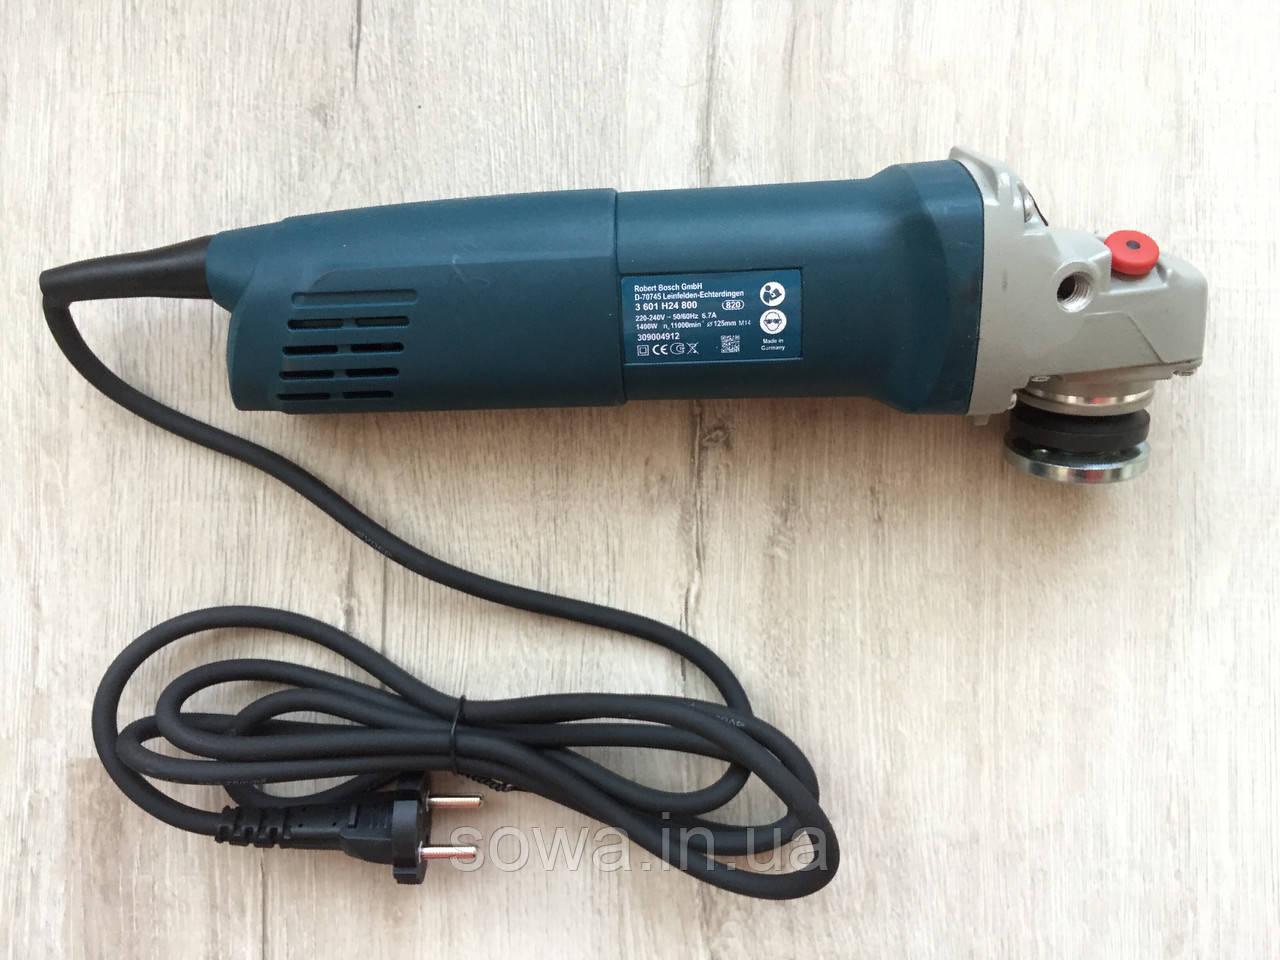 Болгарка BOSCH_ БОШ GWS1400 ( 1400 Вт, 125 мм ) + ПОДАРОК - фото 4